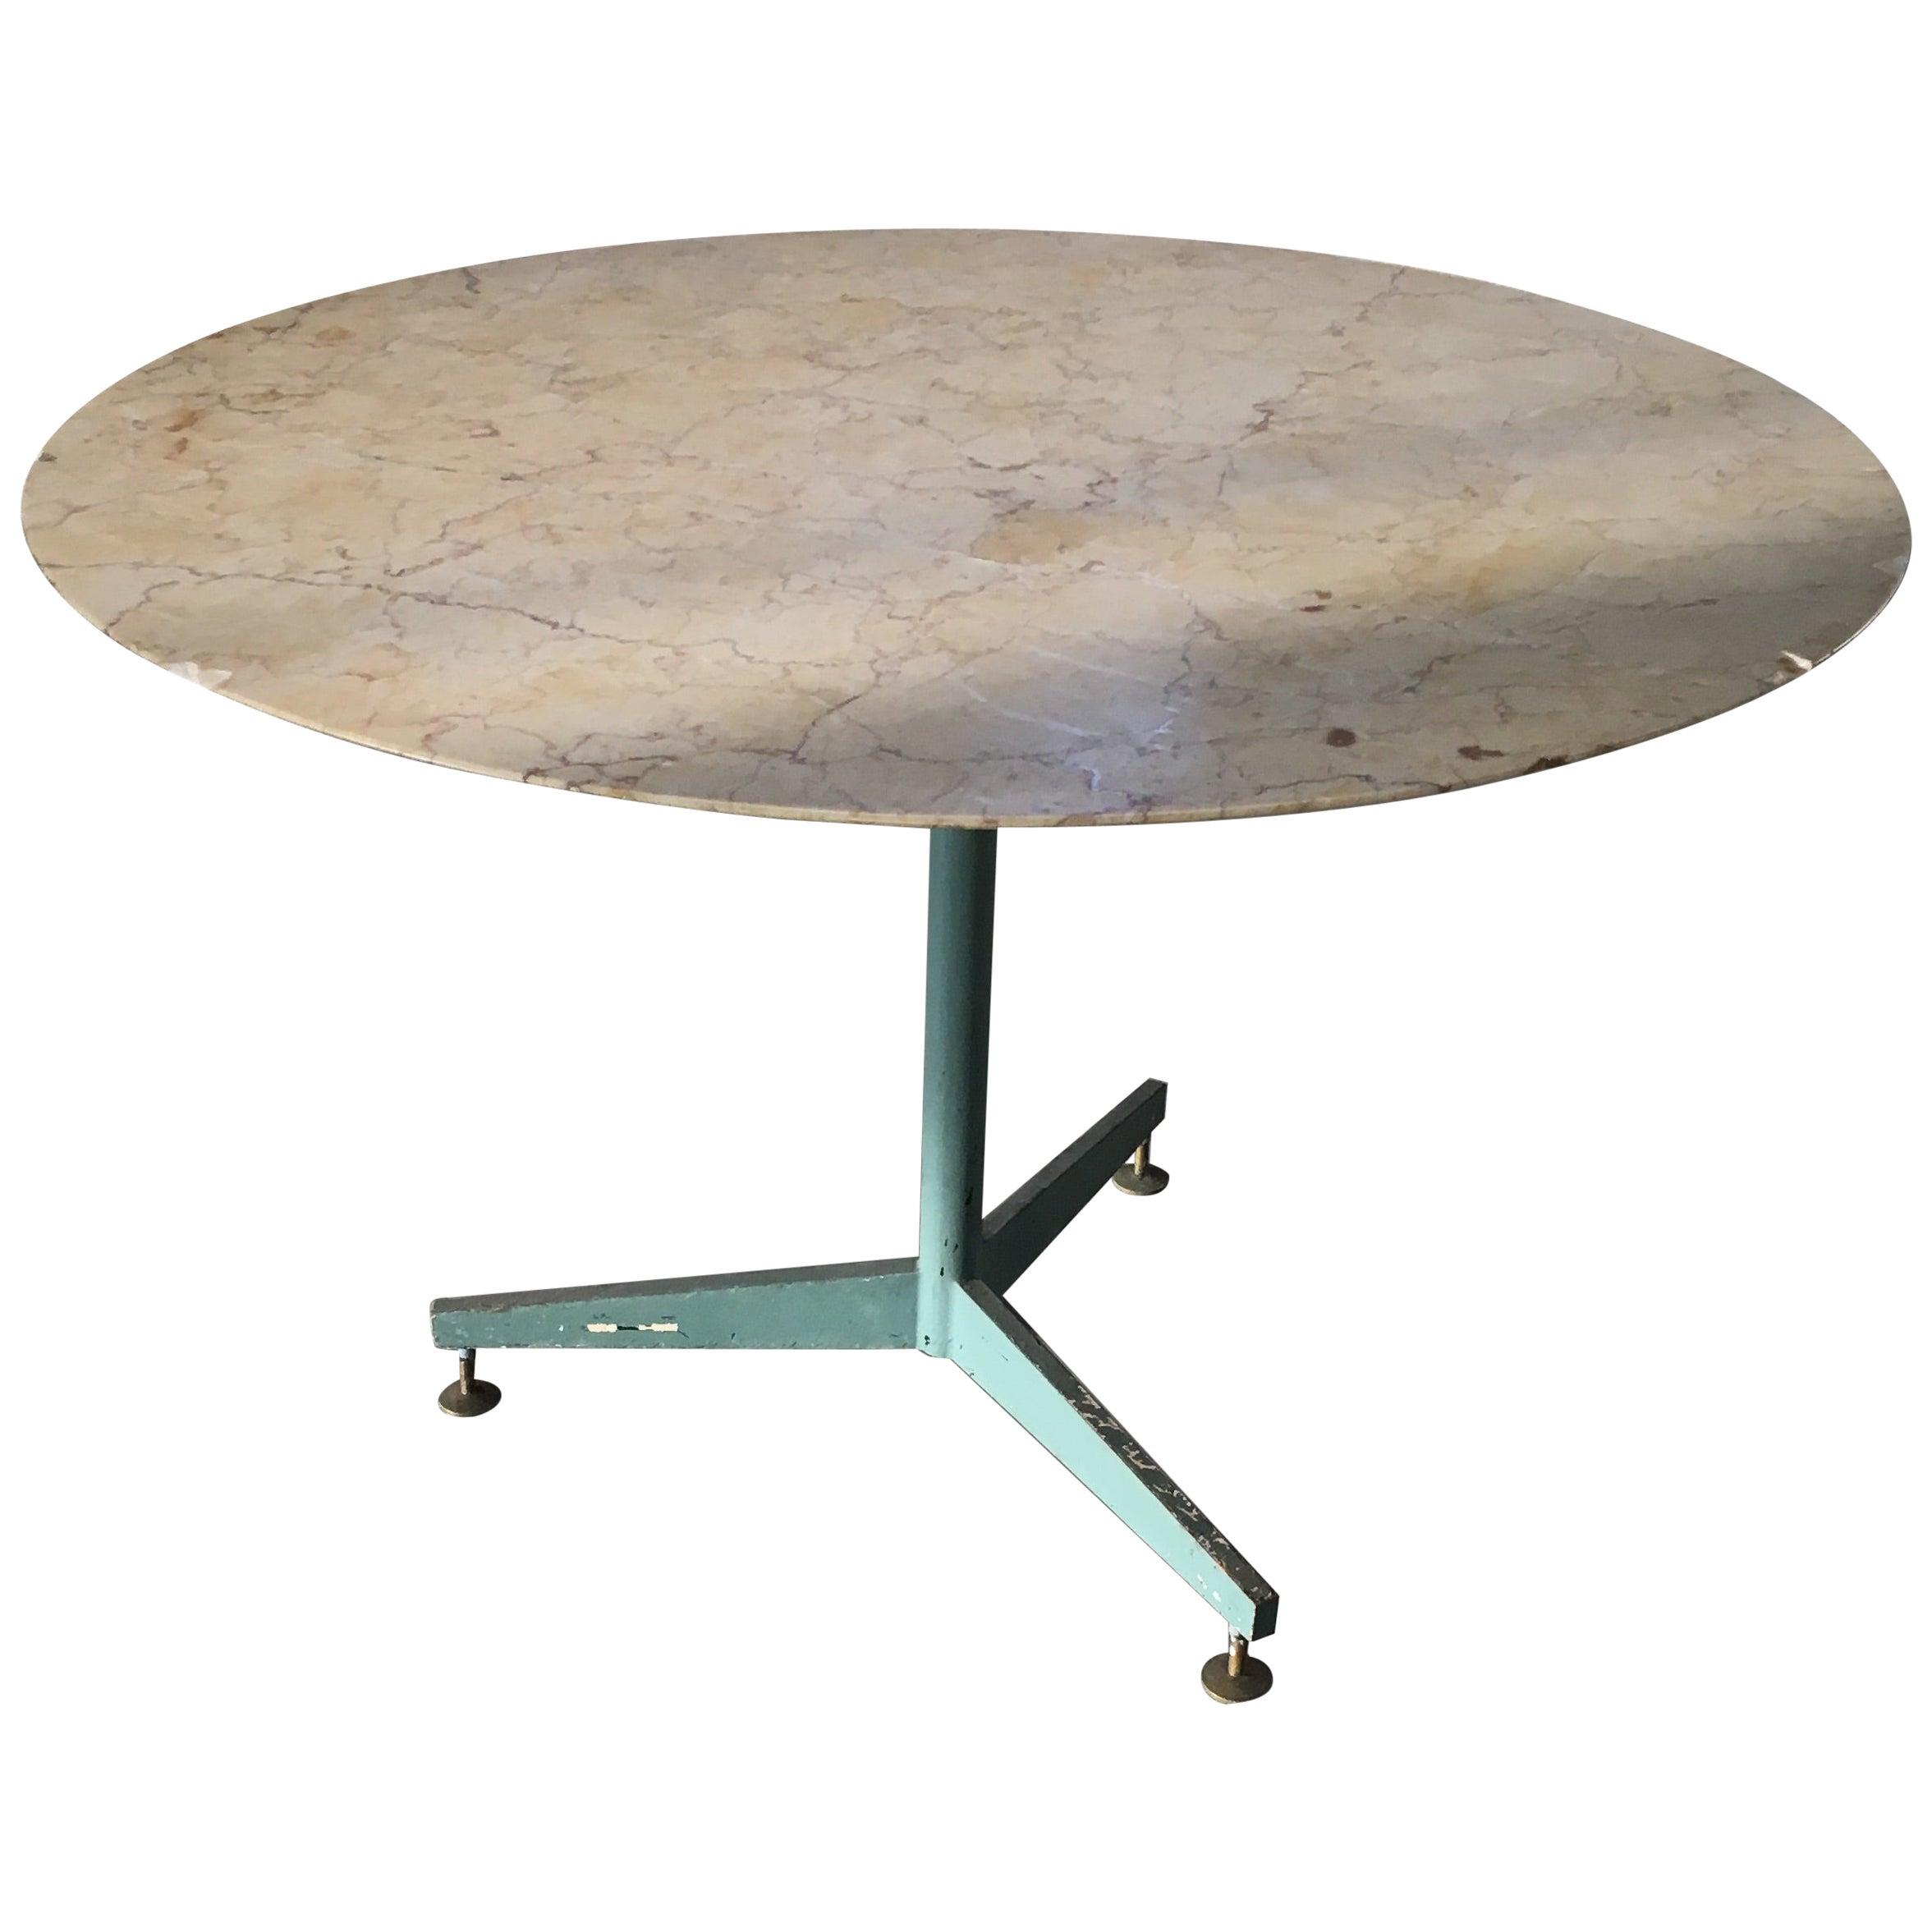 Mid-Century Modern Italian Iron Base Table with Marble Top, 1960s